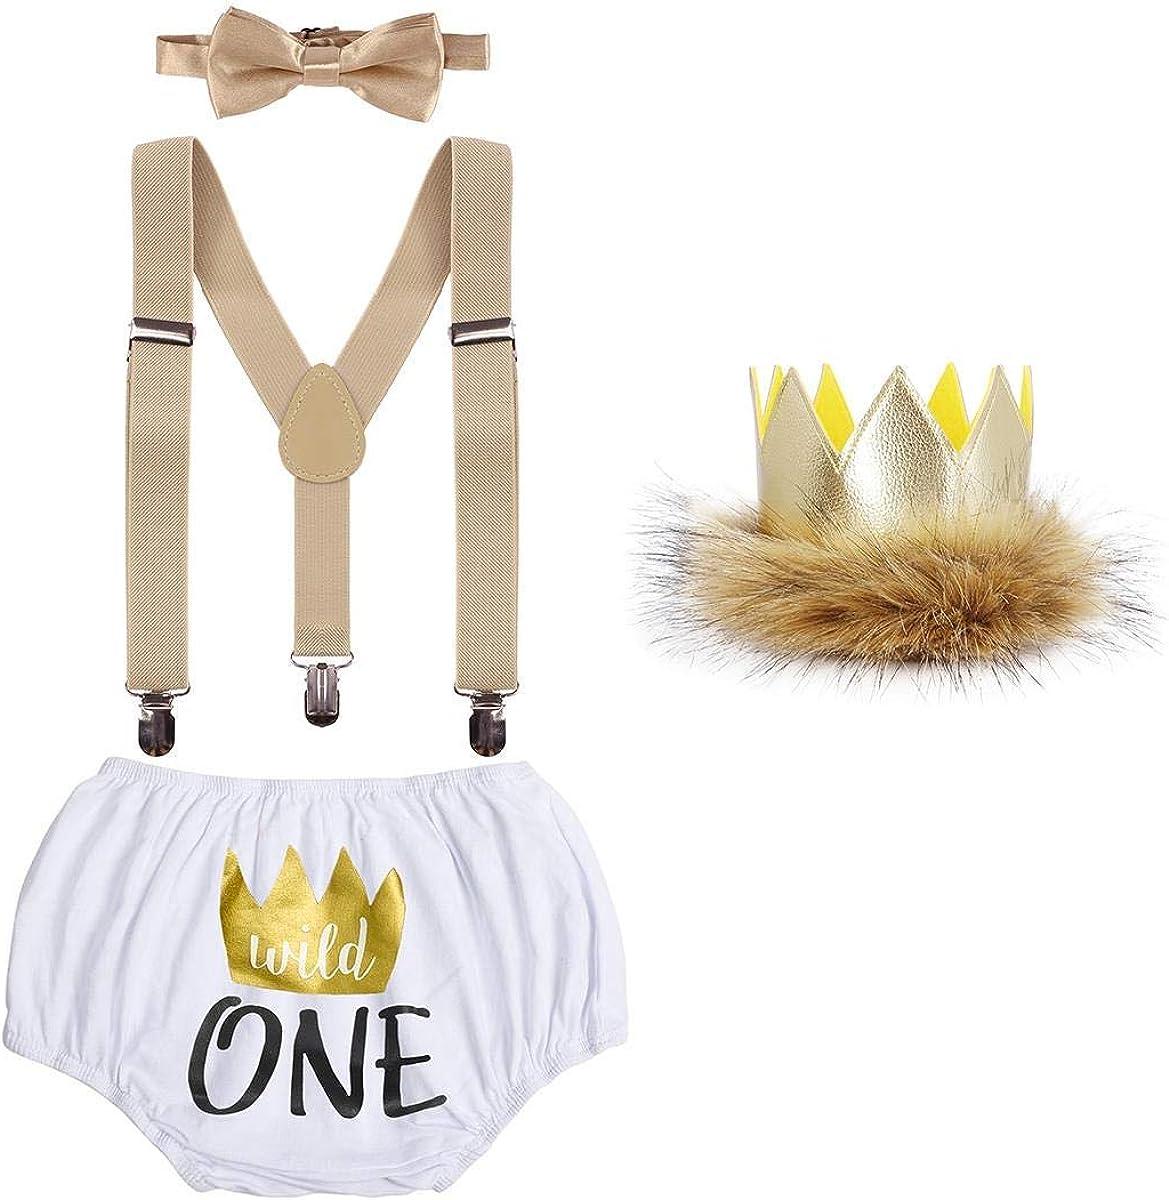 ODASDO Baby Boy 1st / 2nd Birthday Cake Smash Outfit Suspender + Bow Tie + Pants + Headband 4pcs Set Photo Props